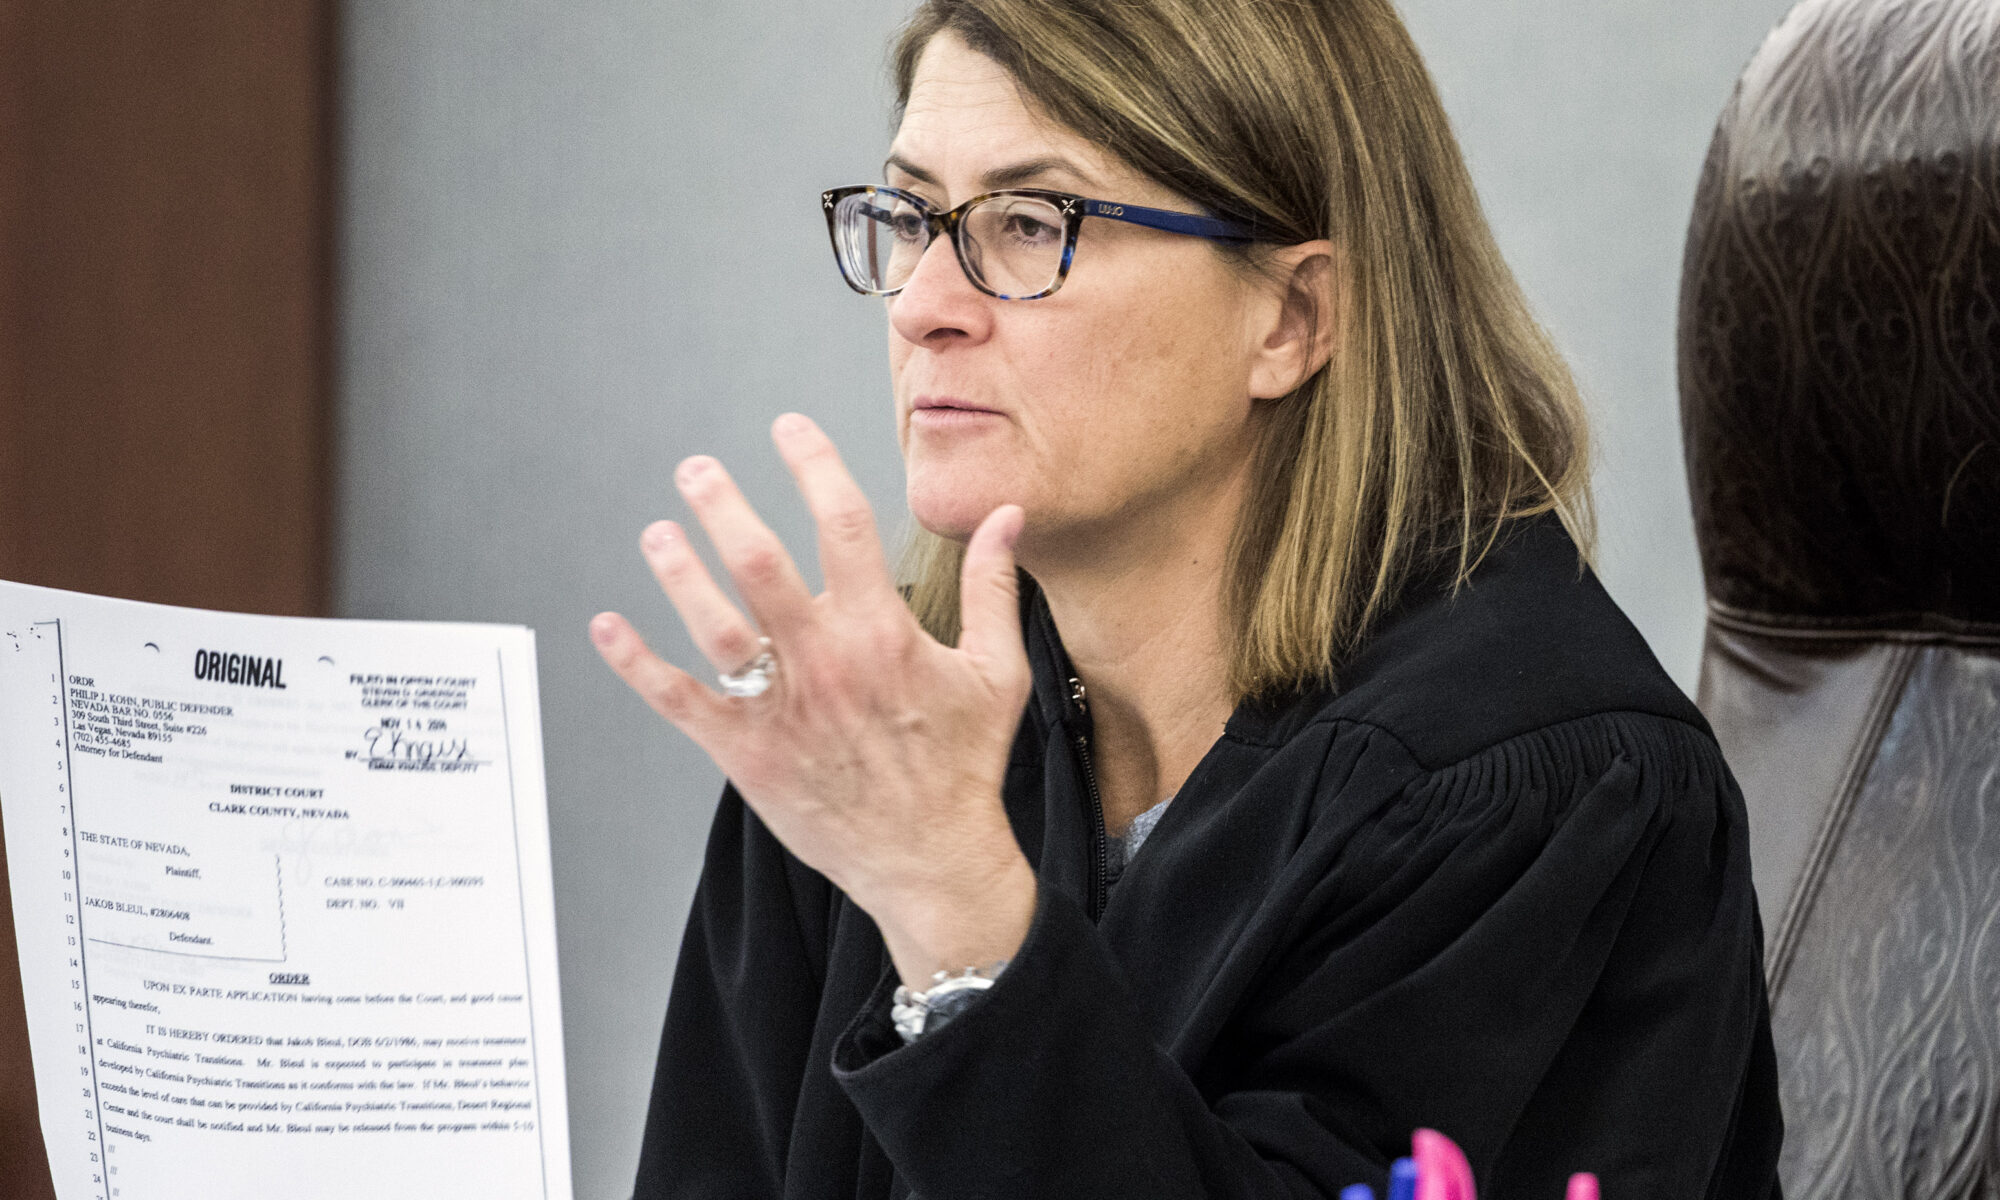 Cortez Masto, Rosen praise Trump's intention to nominate Togliatti to federal bench